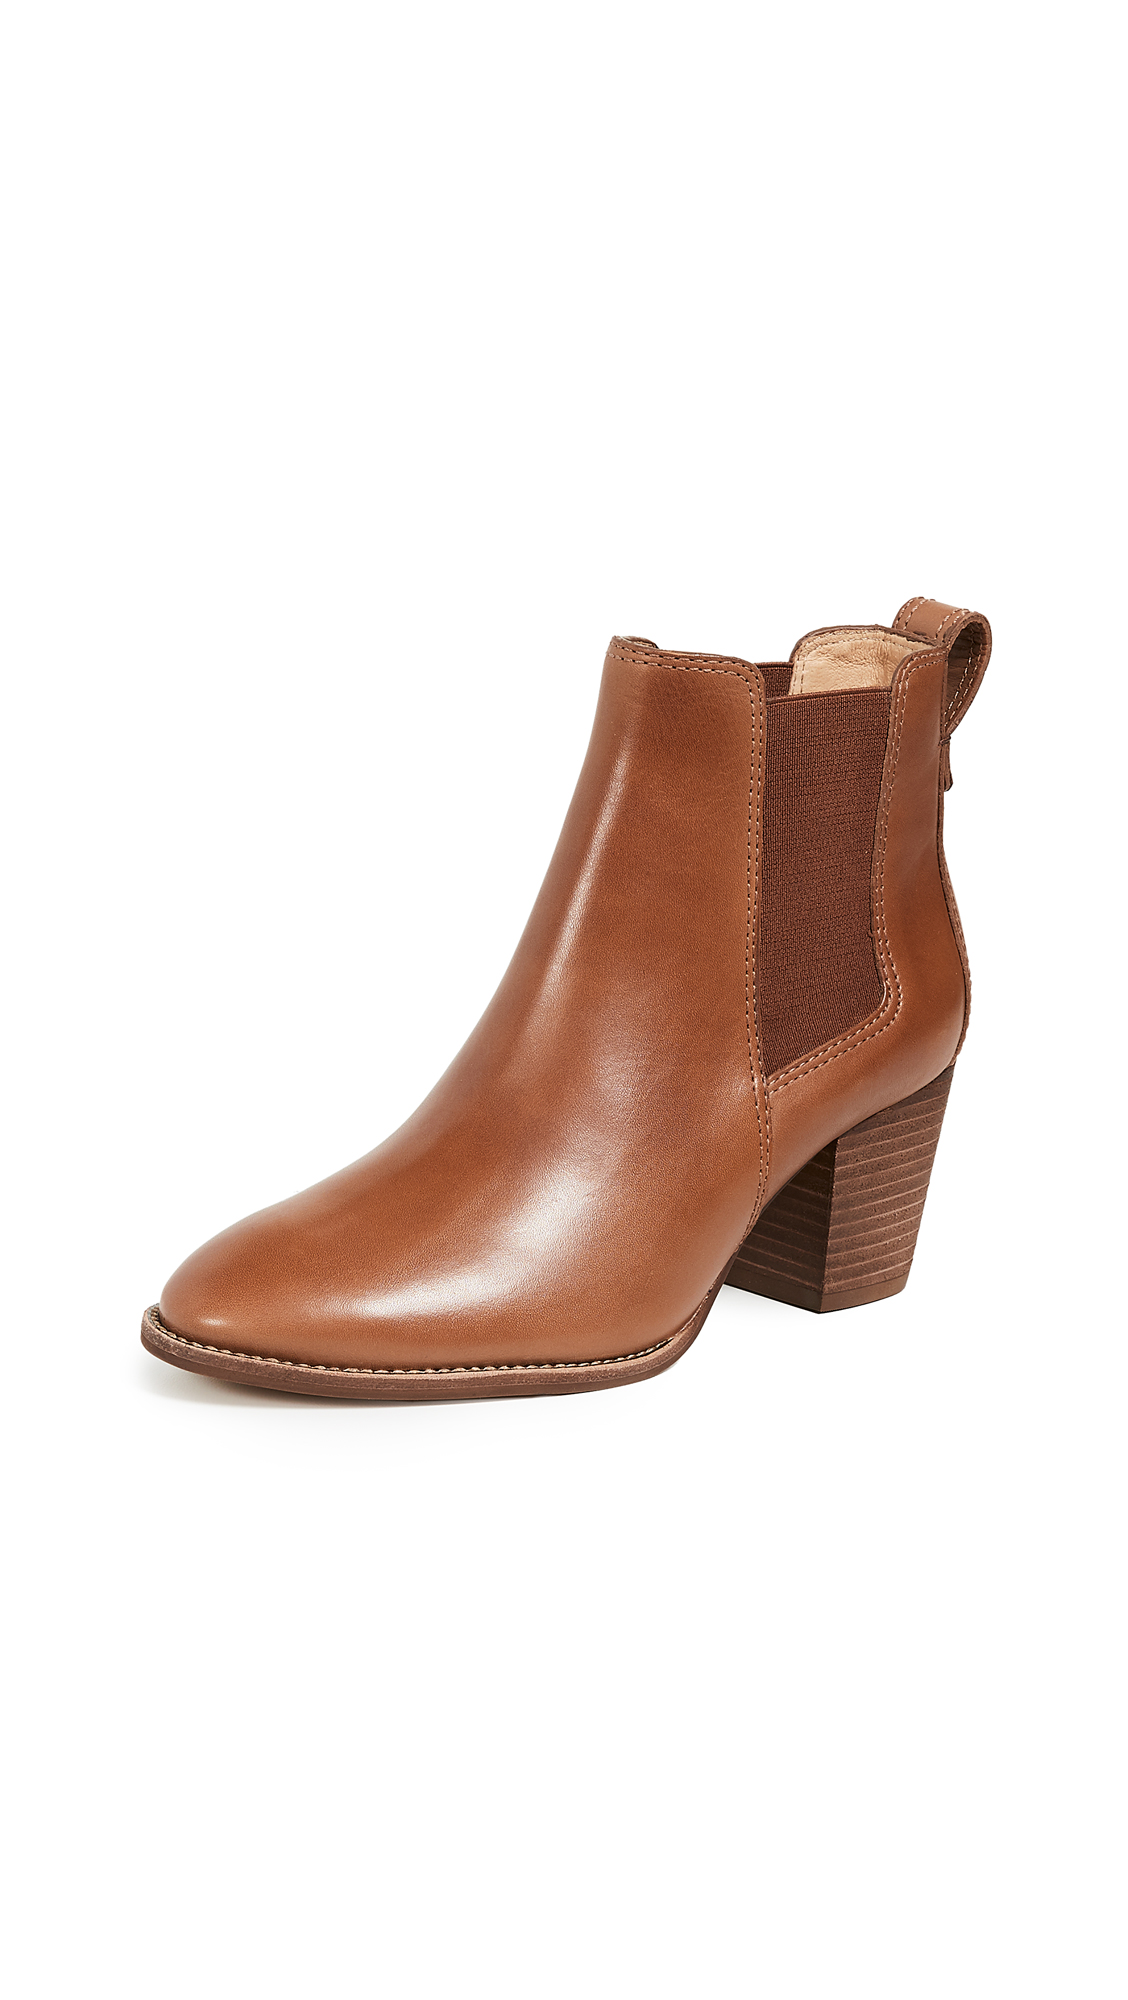 Madewell Heeled Chelsea Boots